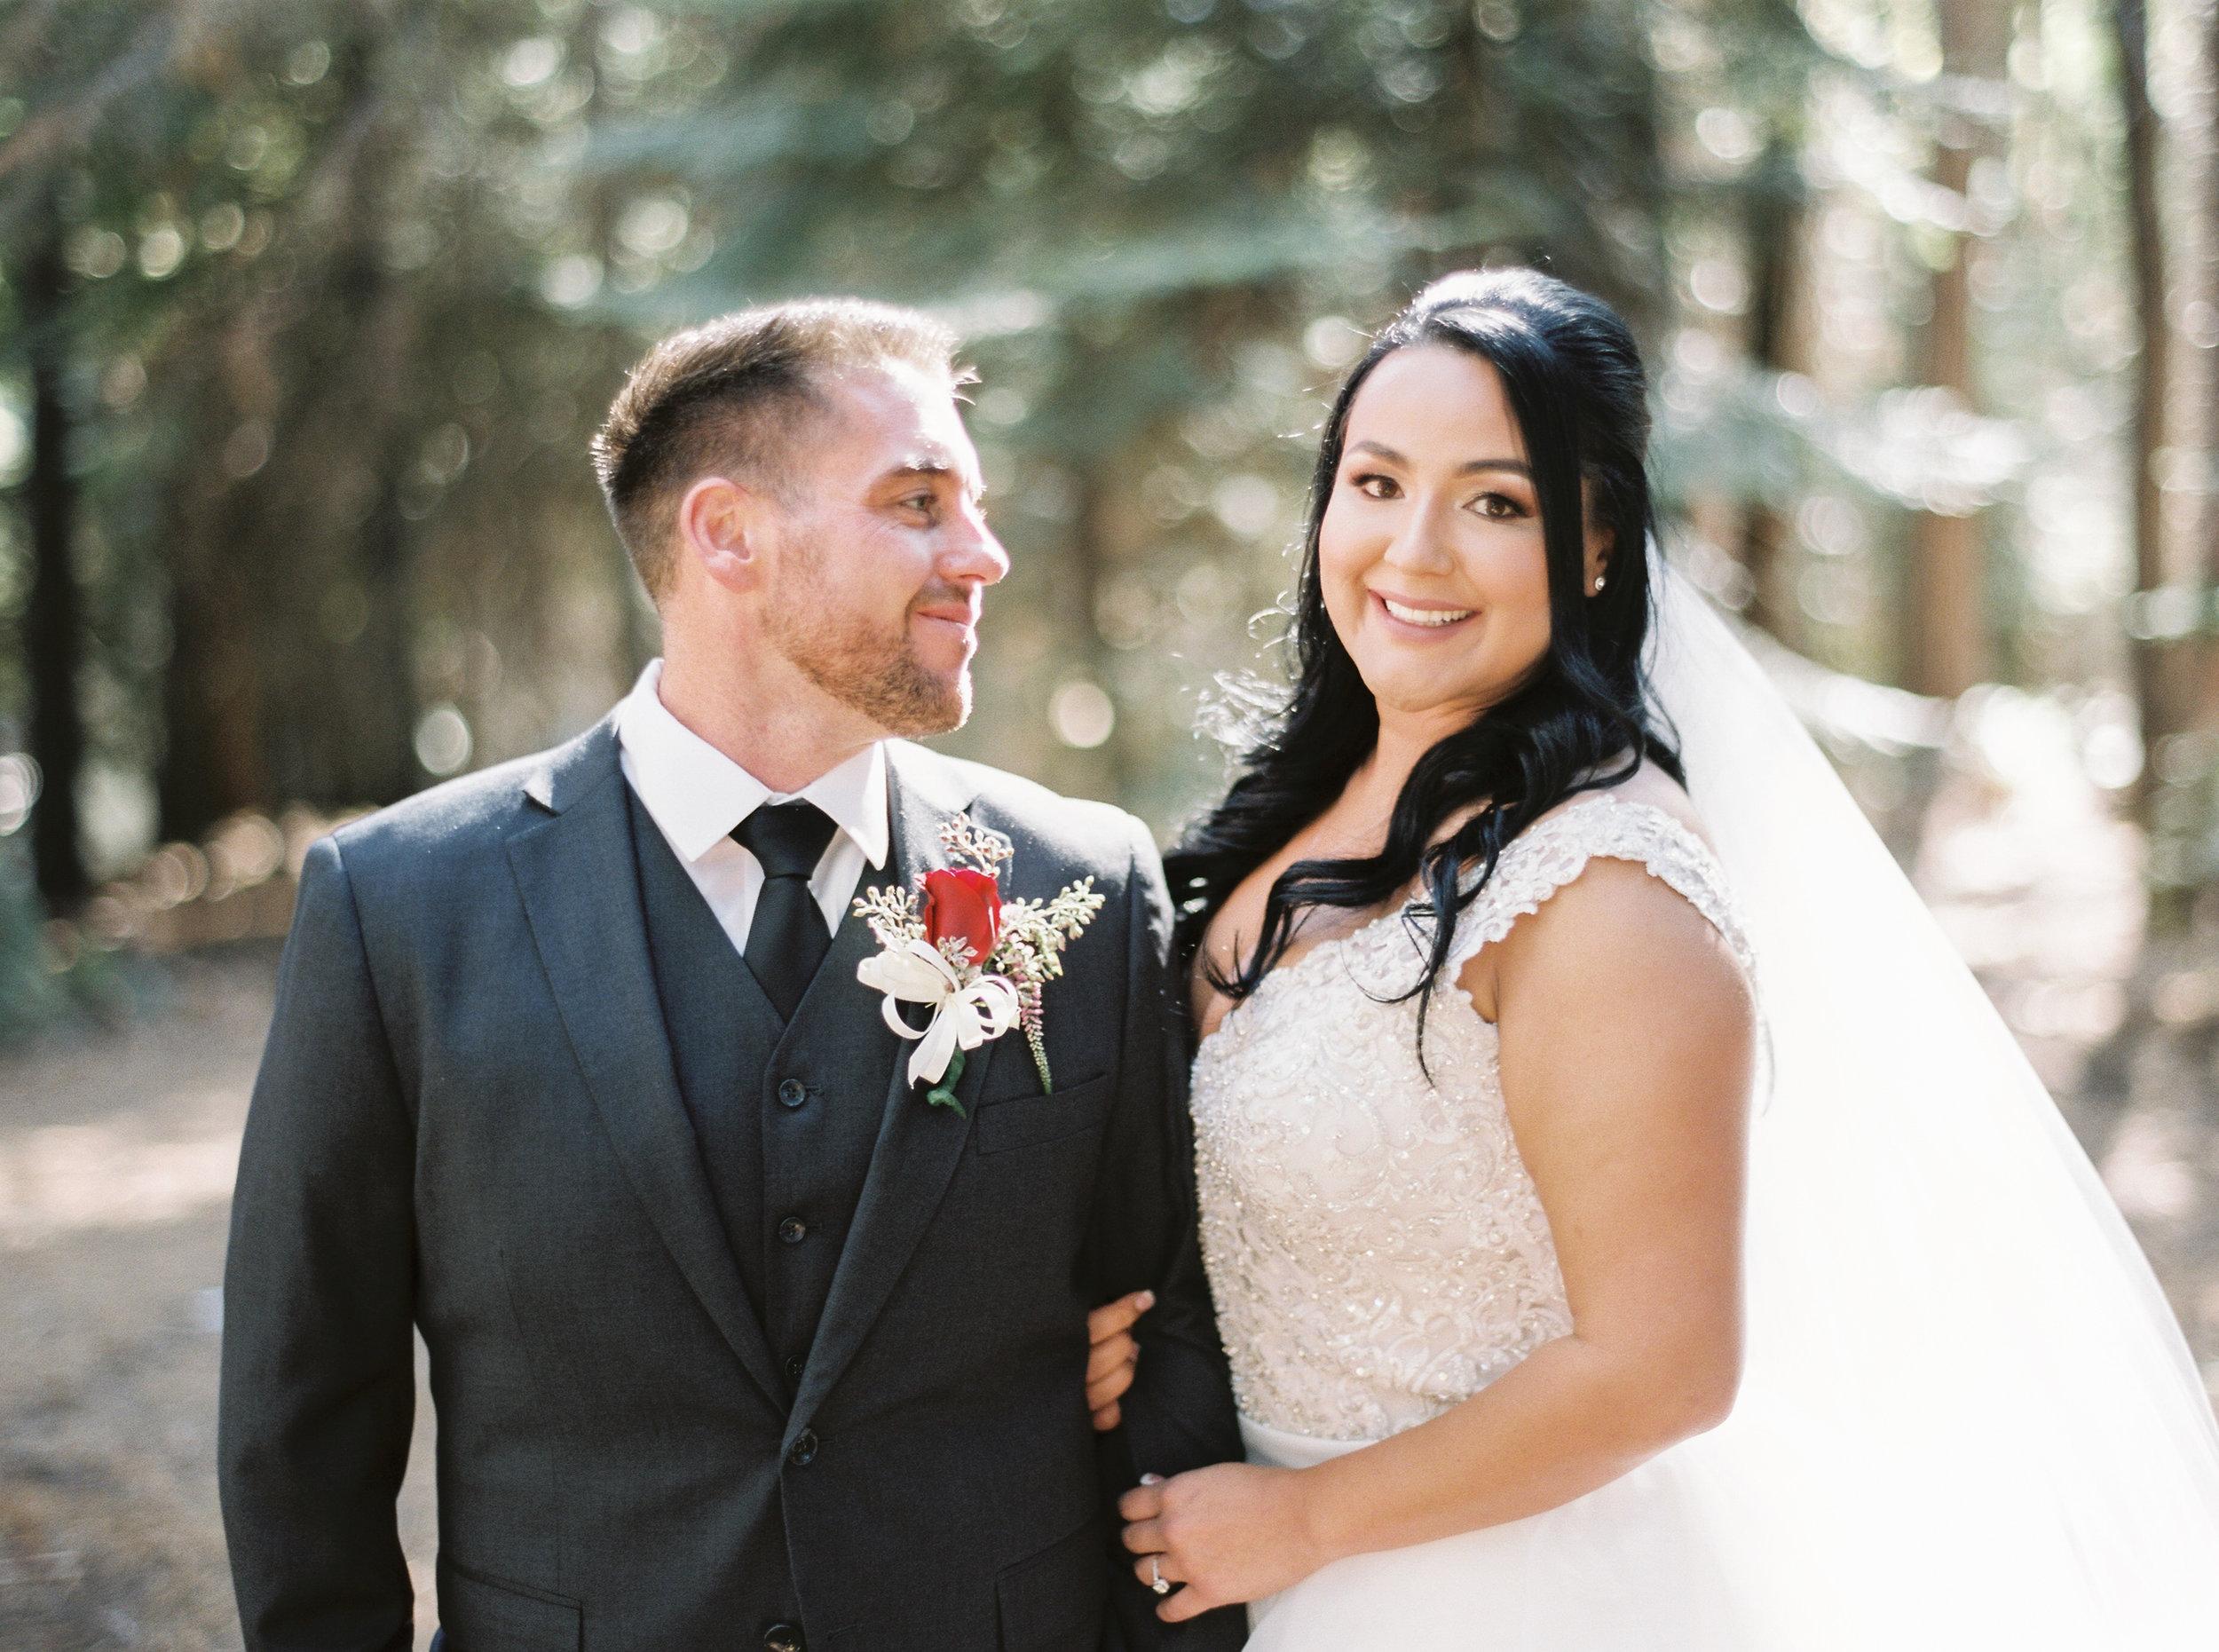 Tenaya-lodge-wedding-at-yosemite-national-park-california-41.jpg